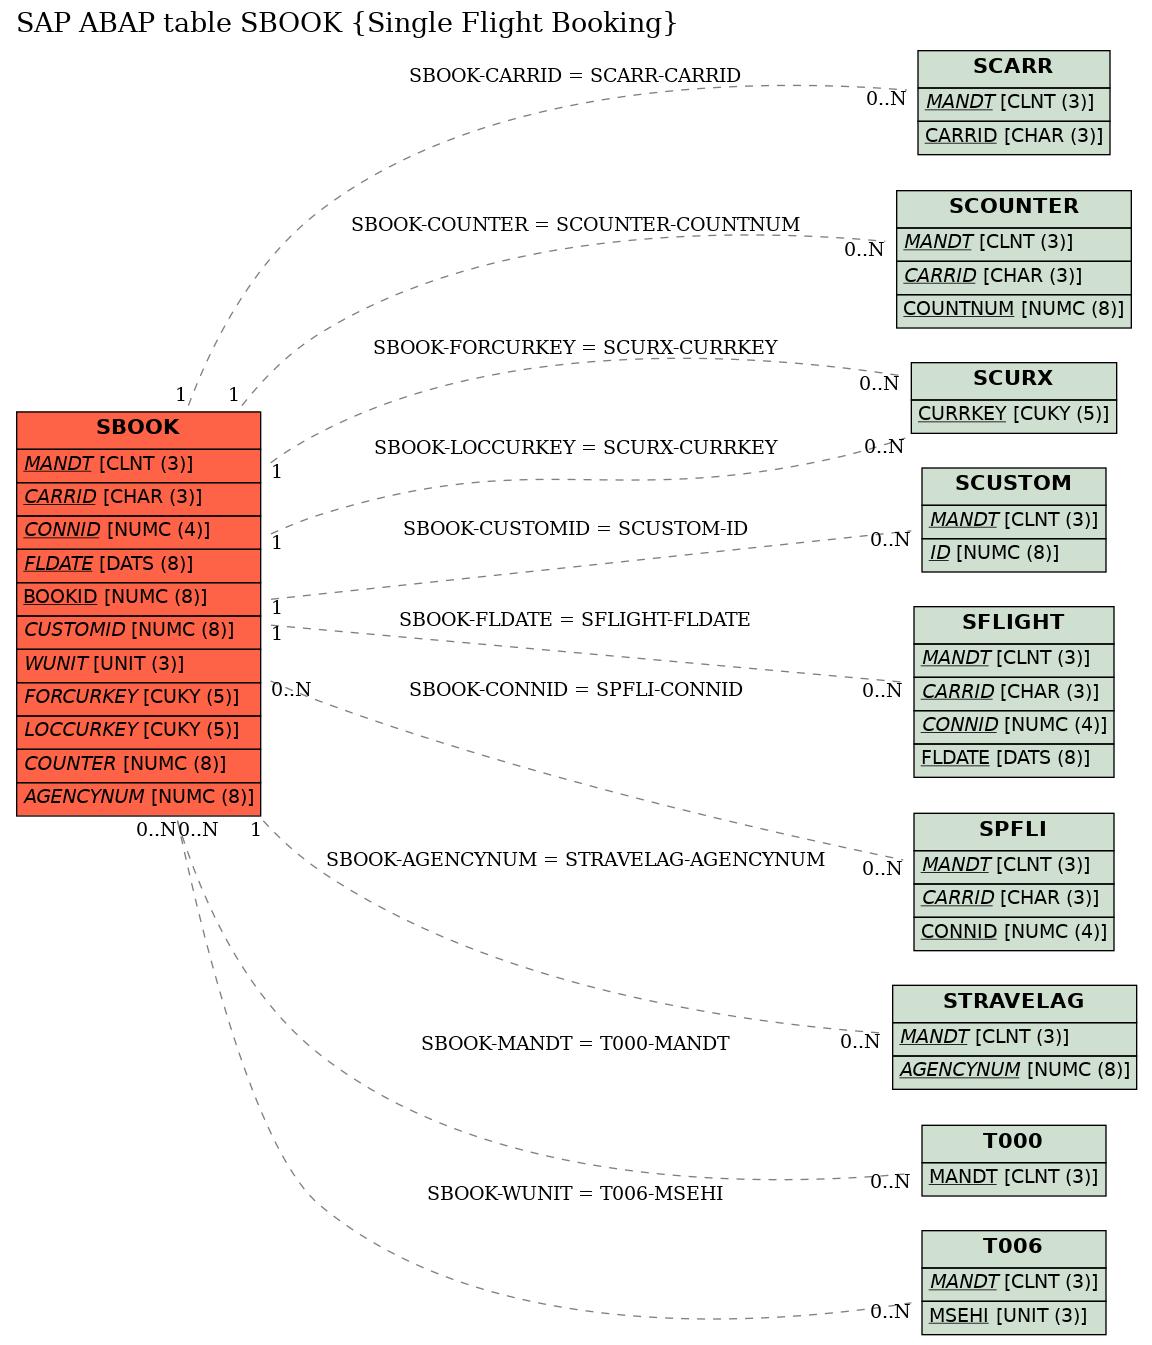 E-R Diagram for table SBOOK (Single Flight Booking)